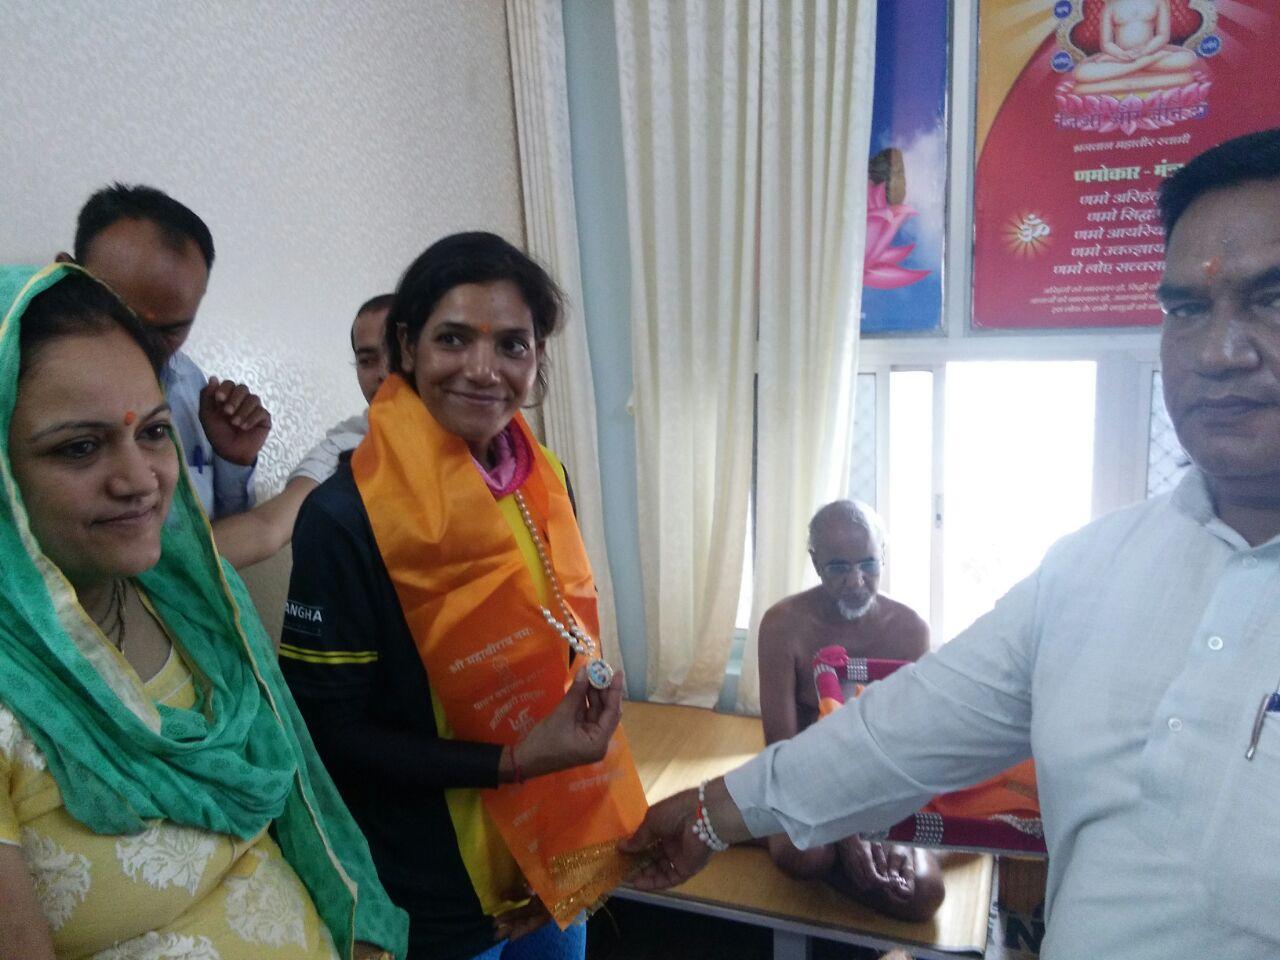 Sunita Singh CHoken with Jain Muni Tarun Sagarji